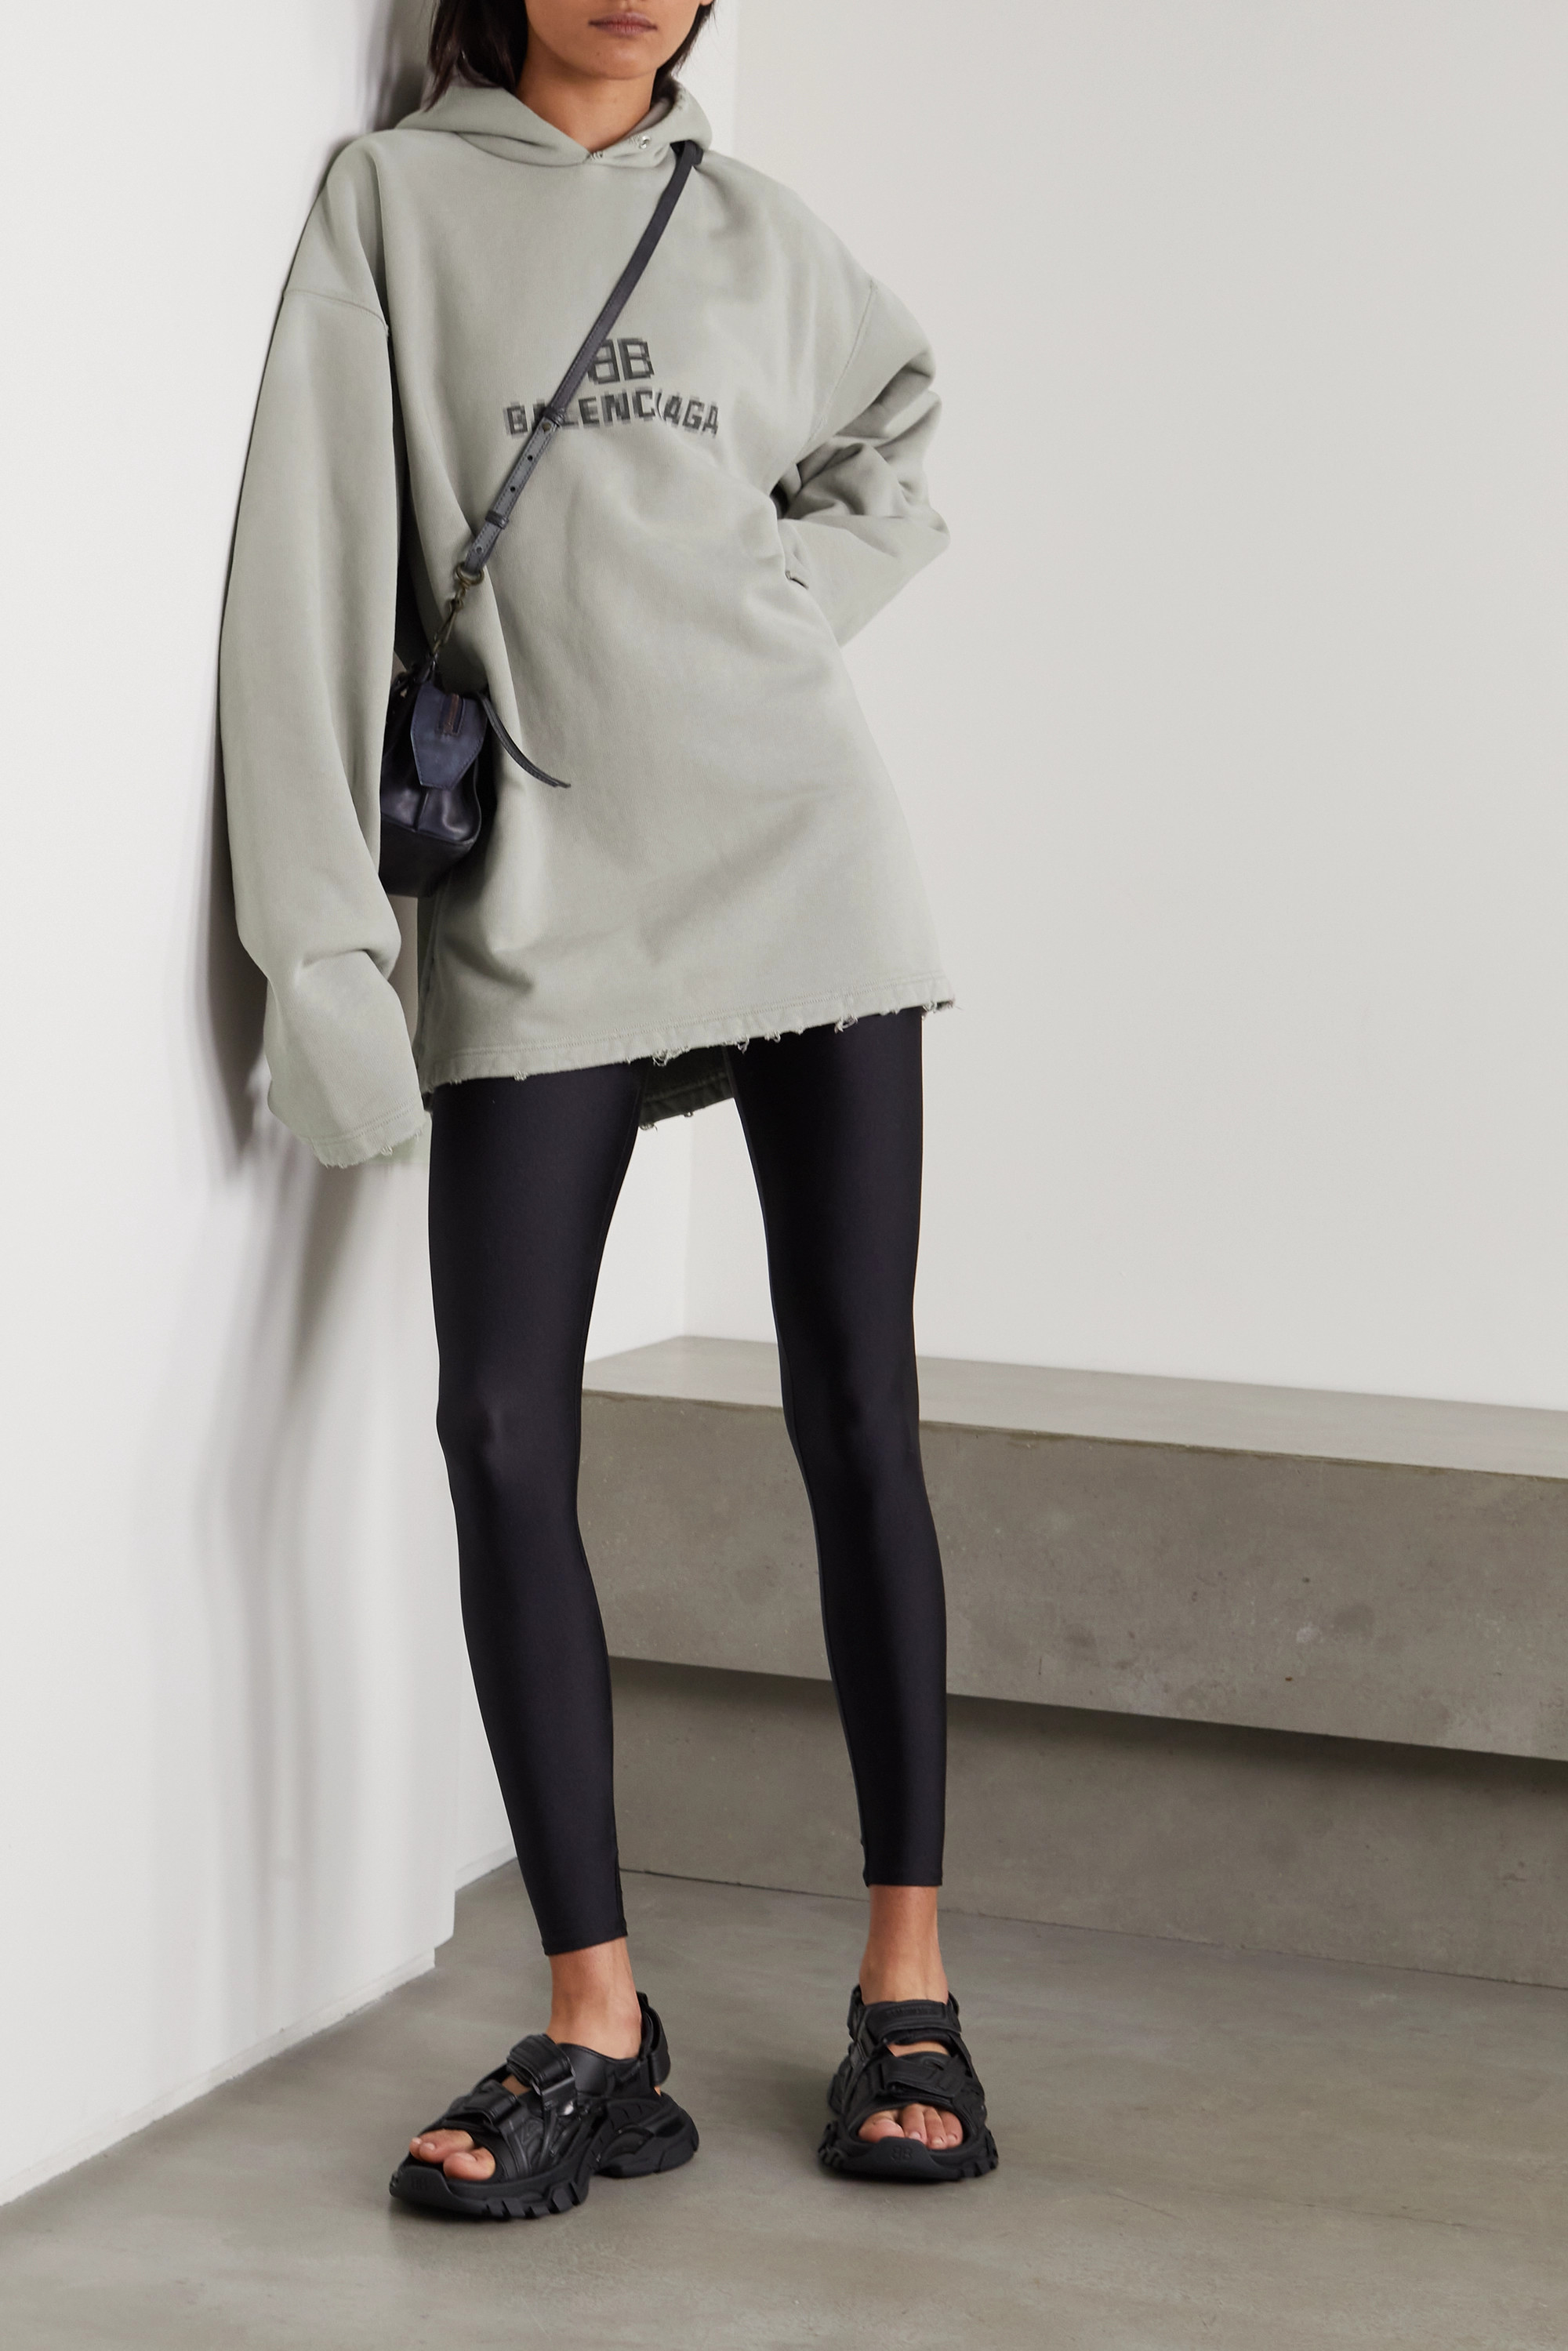 Balenciaga Sweat à capuche en jersey de coton imprimé effet vieilli